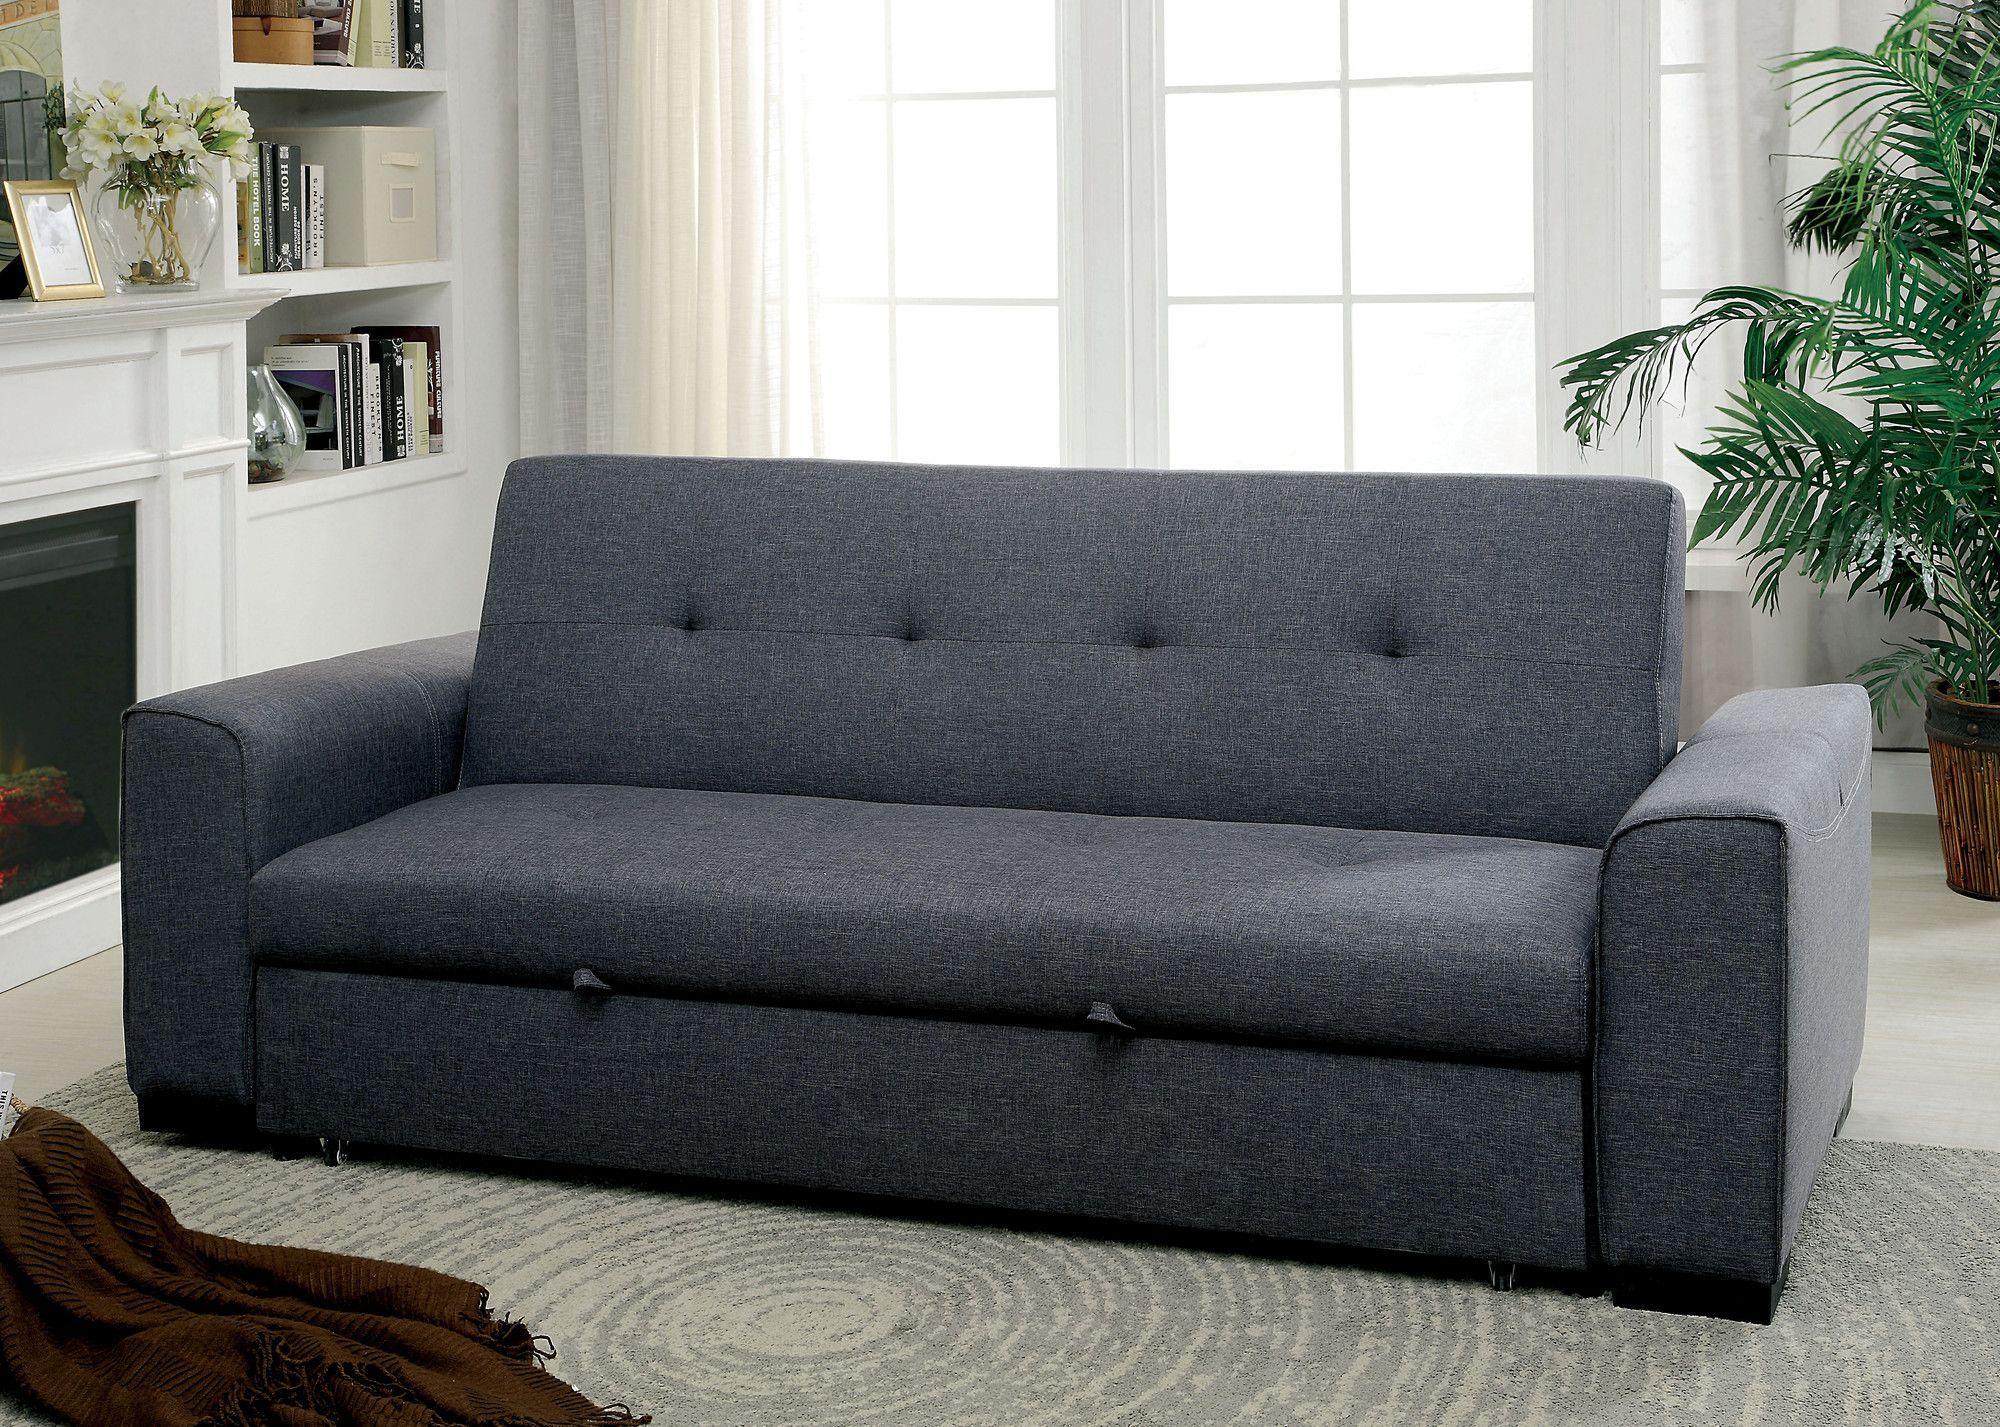 Randy pull out sleeper futon convertible sofa futuristic sofas